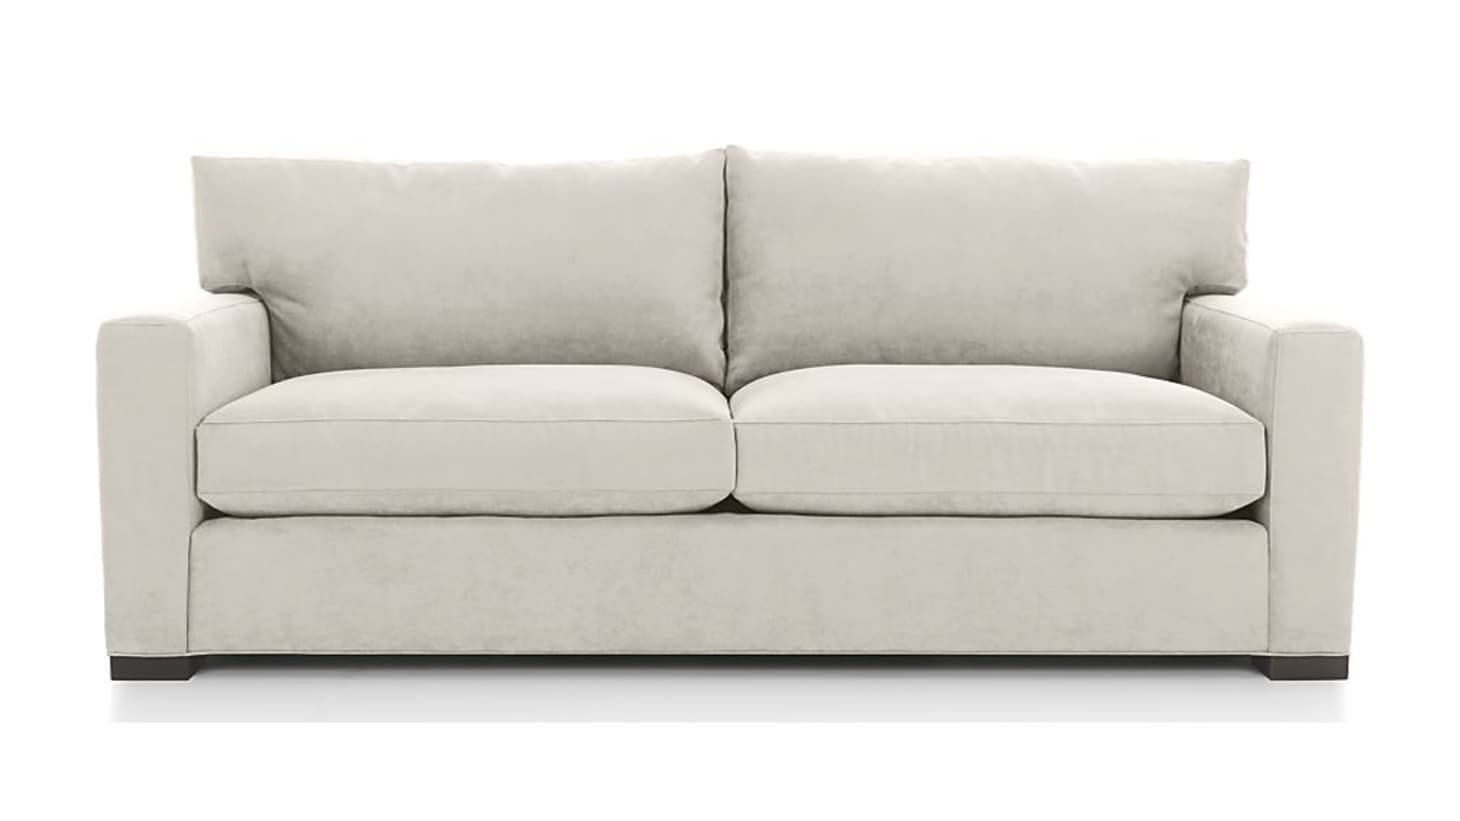 Enjoyable Reviewed The Most Comfortable Sofas At Crate Barrel Creativecarmelina Interior Chair Design Creativecarmelinacom